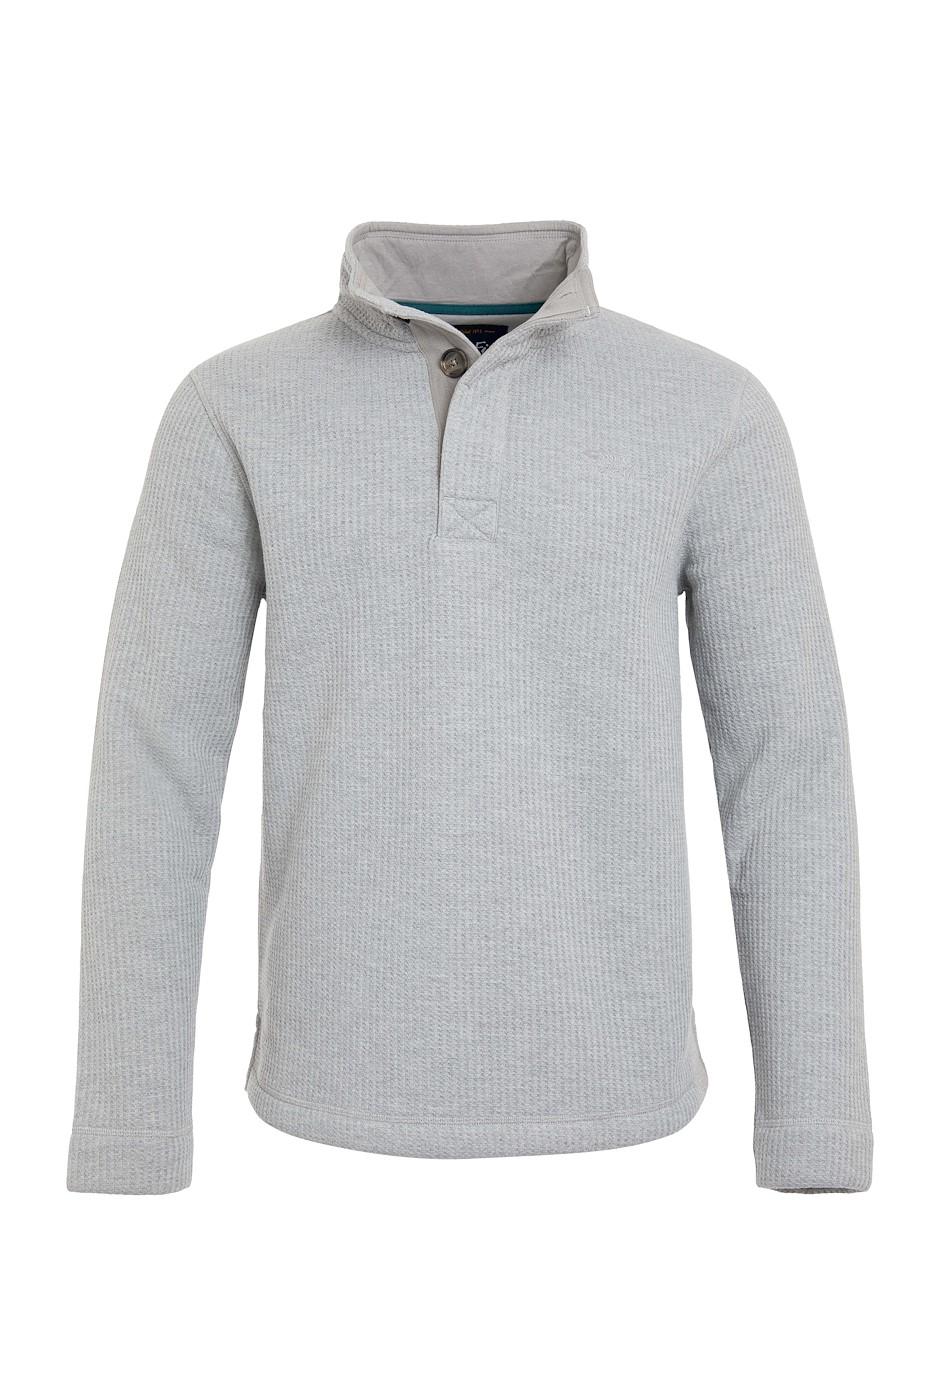 Floyd Button Neck Bonded Waffle Sweatshirt Frost Grey